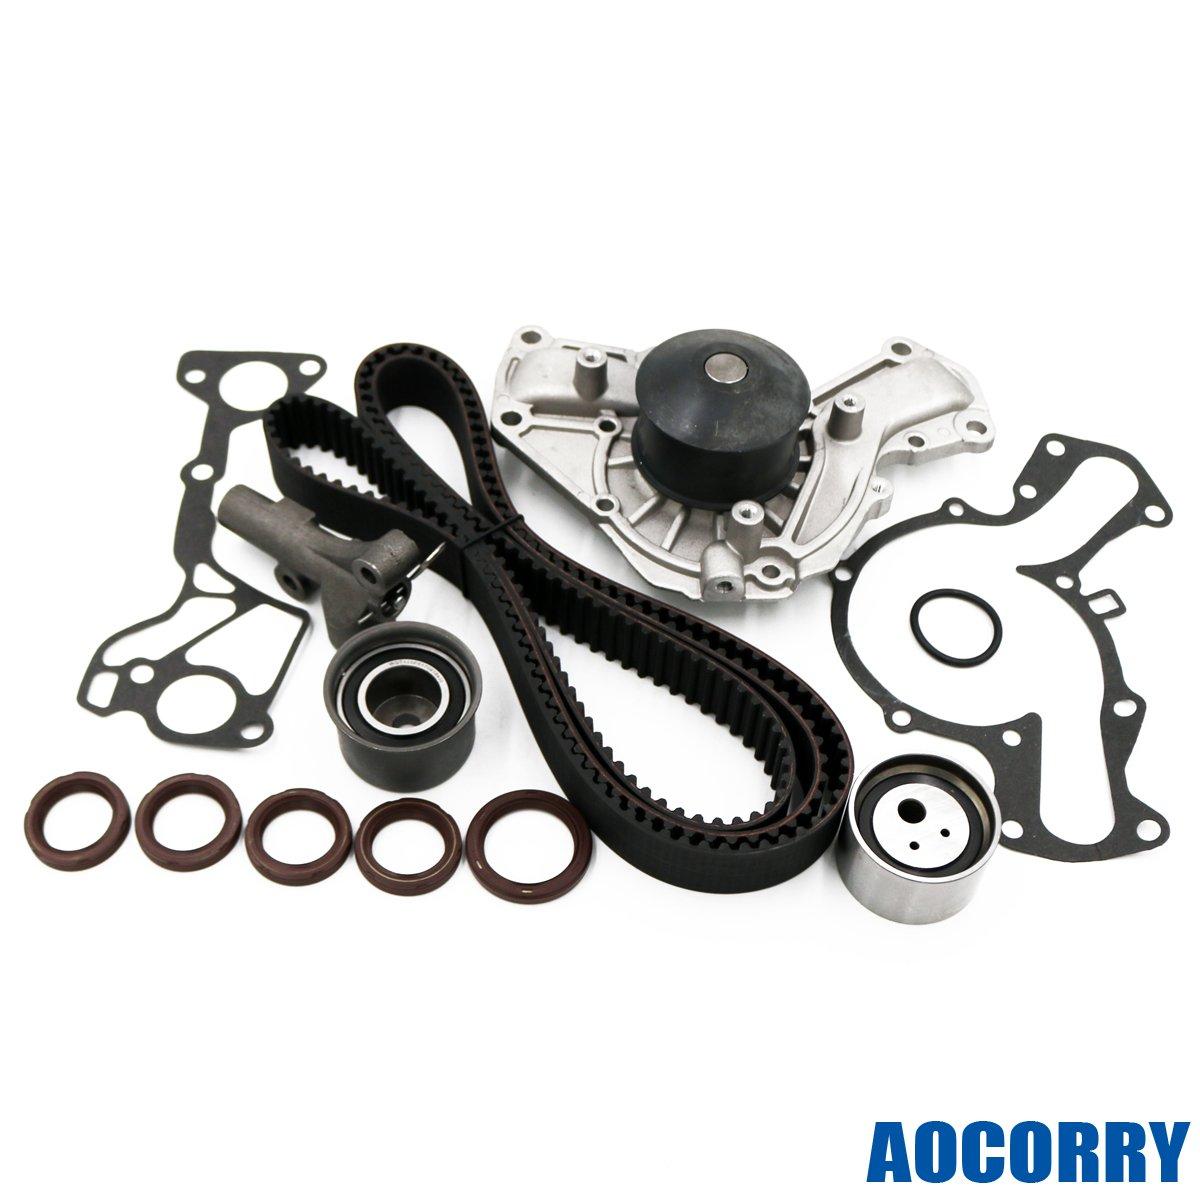 Aocorry Timing Belt Water Pump Kit Fits 91 99 Saturn Vue Mitsusbishi 3000gt Dodge Stealth 30l Automotive